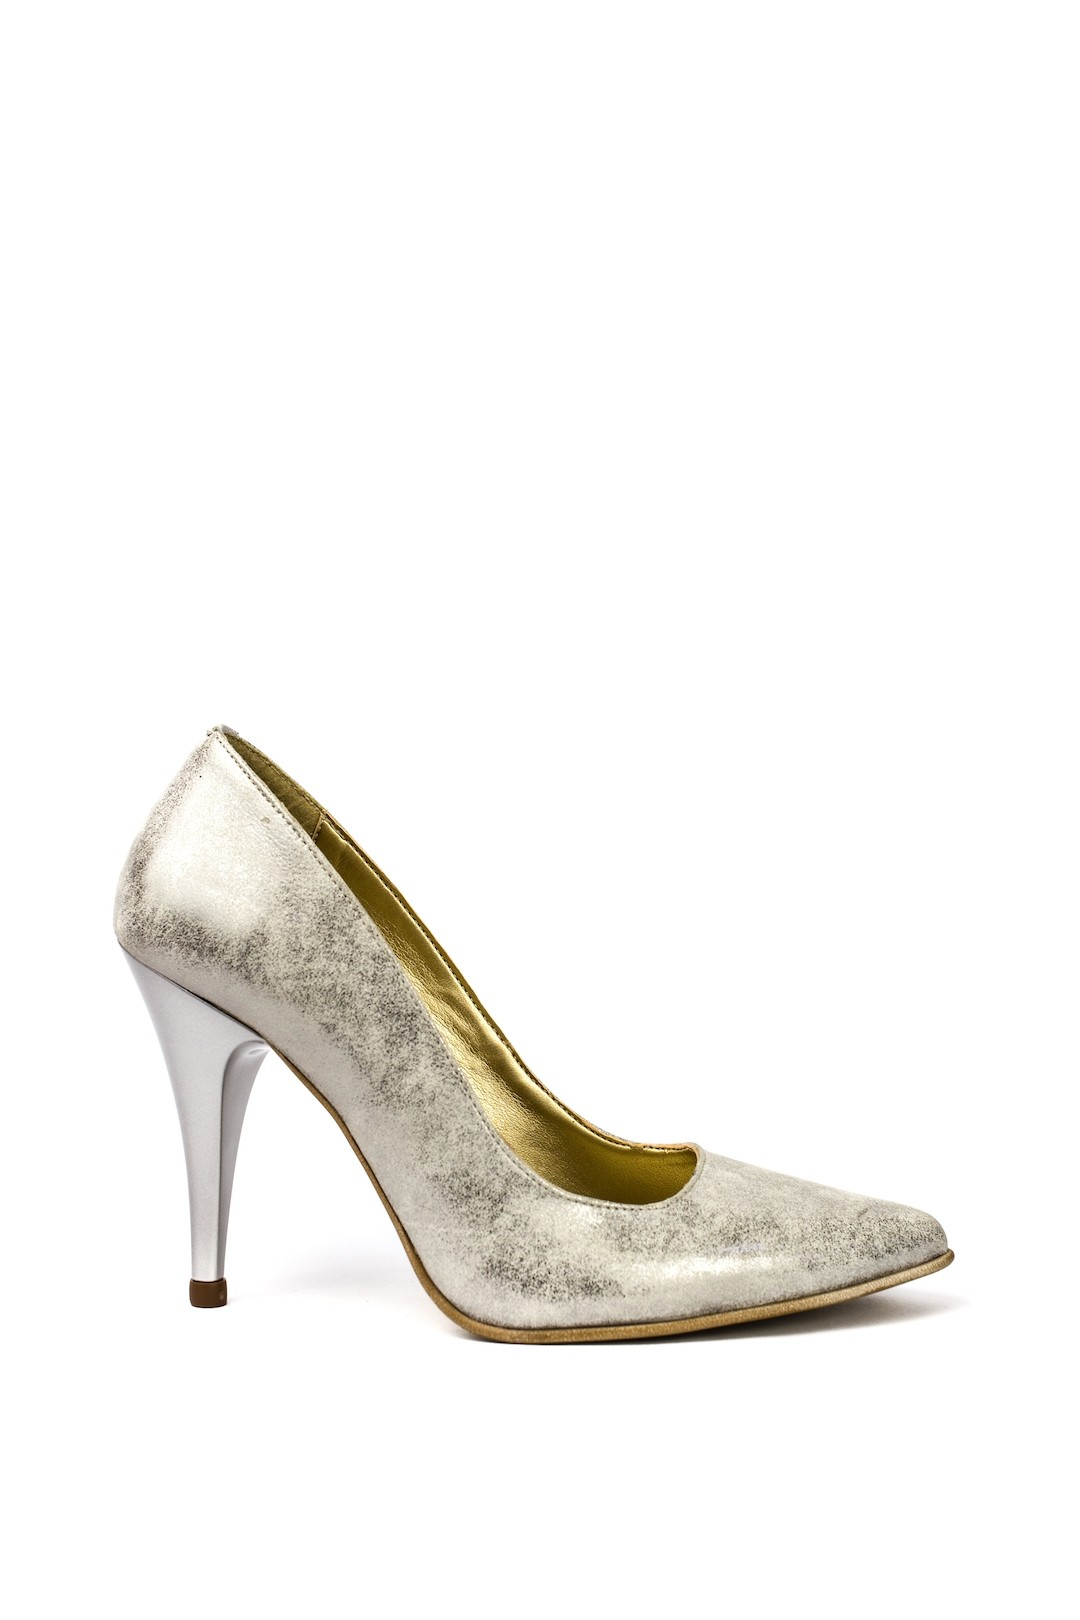 Pantofi Dama piele naturala argintiu Magda